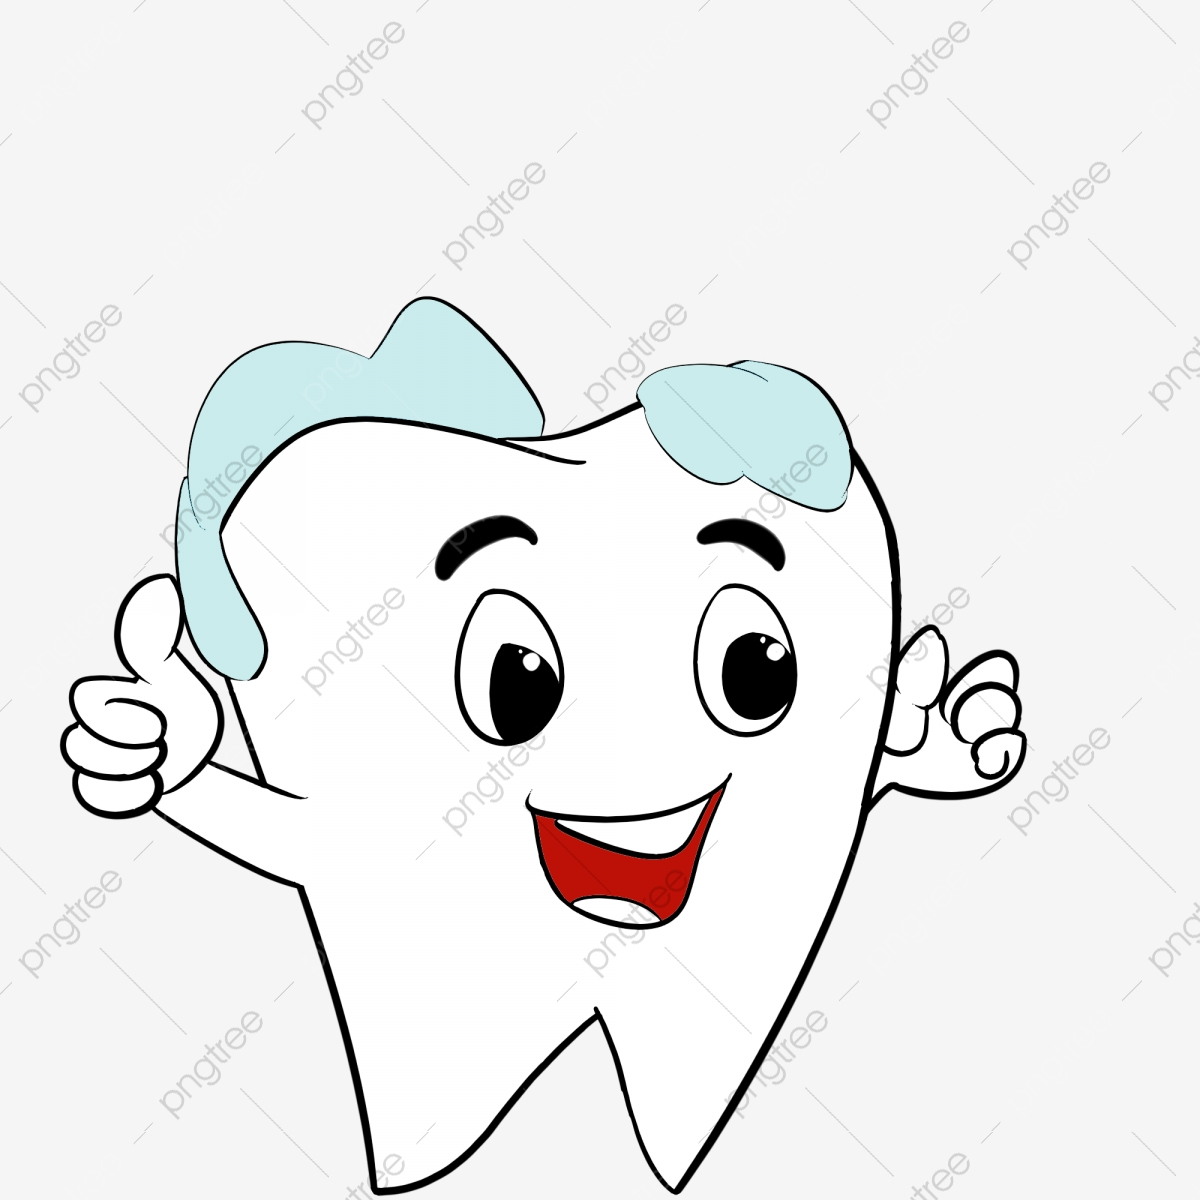 Tooth clipart diamond. Teeth us dental png